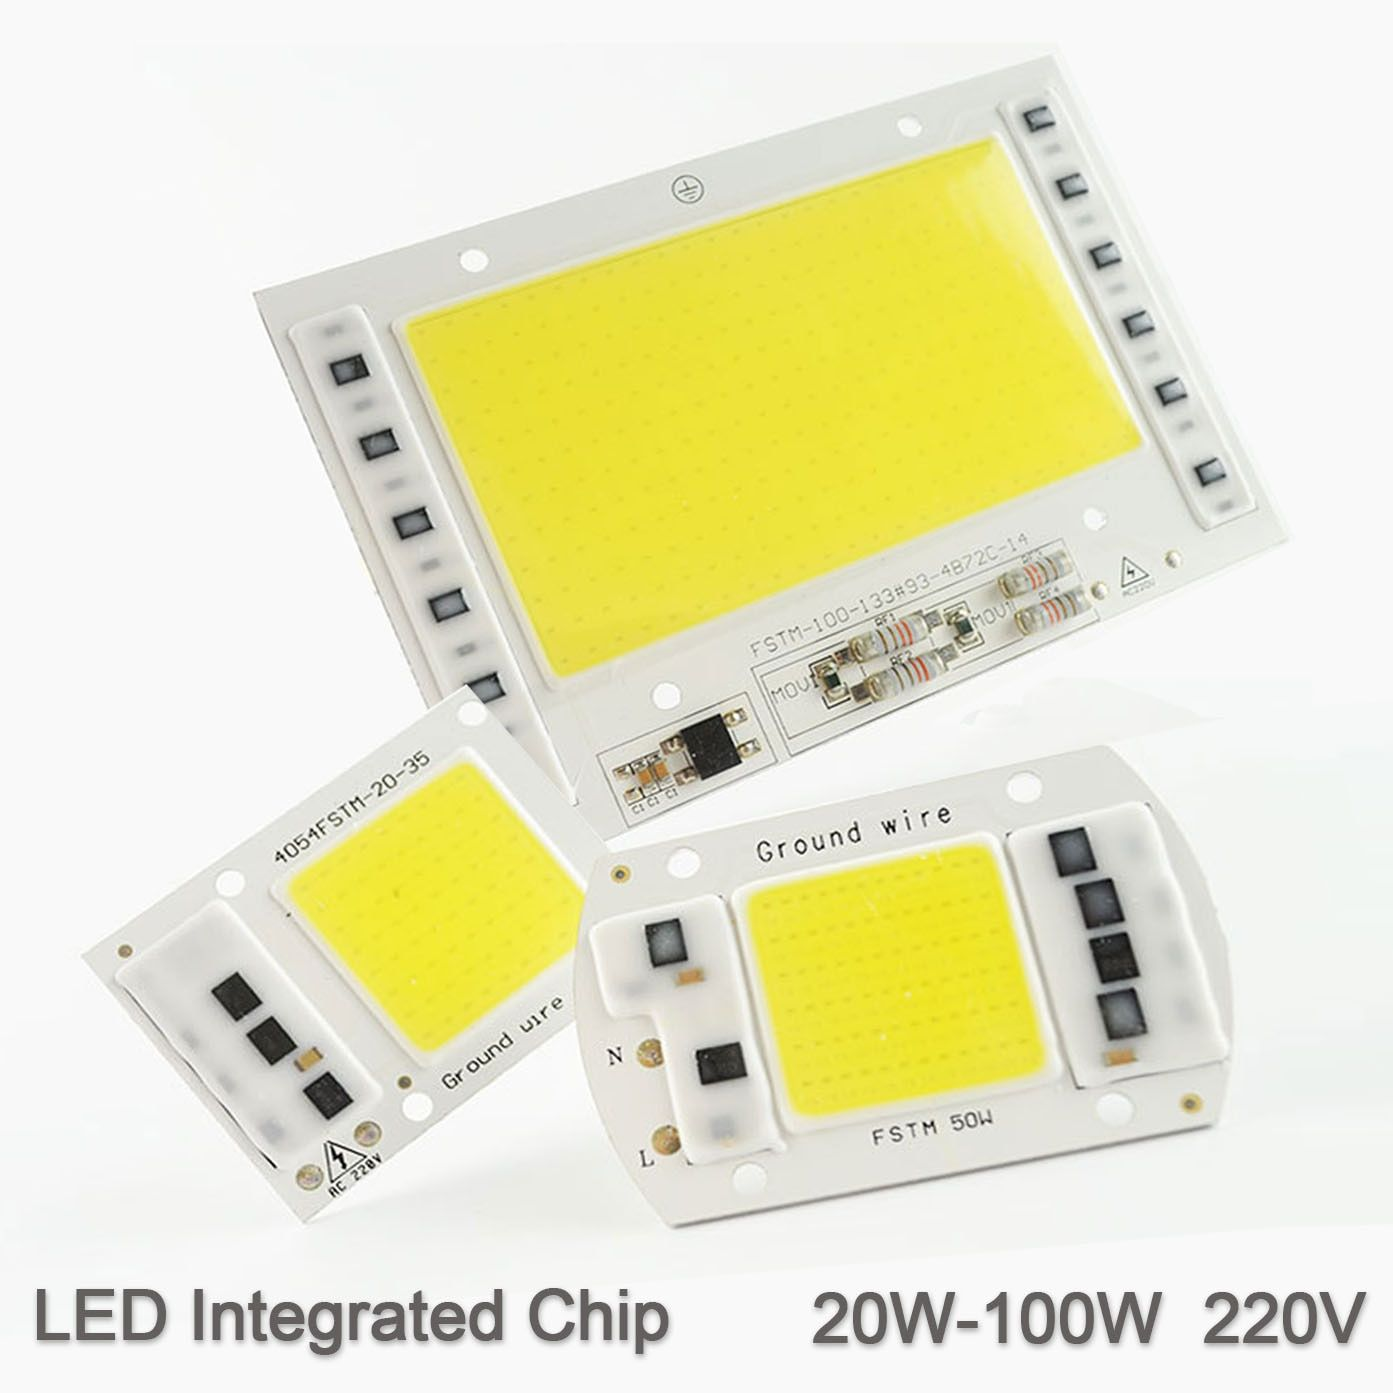 LED Lamp Chip Integrated COB 5W 20W 30W 50W 100W 220V 240V Smart IC Driver Cold Warm White LED Spotlight Floodlight Growth Grow